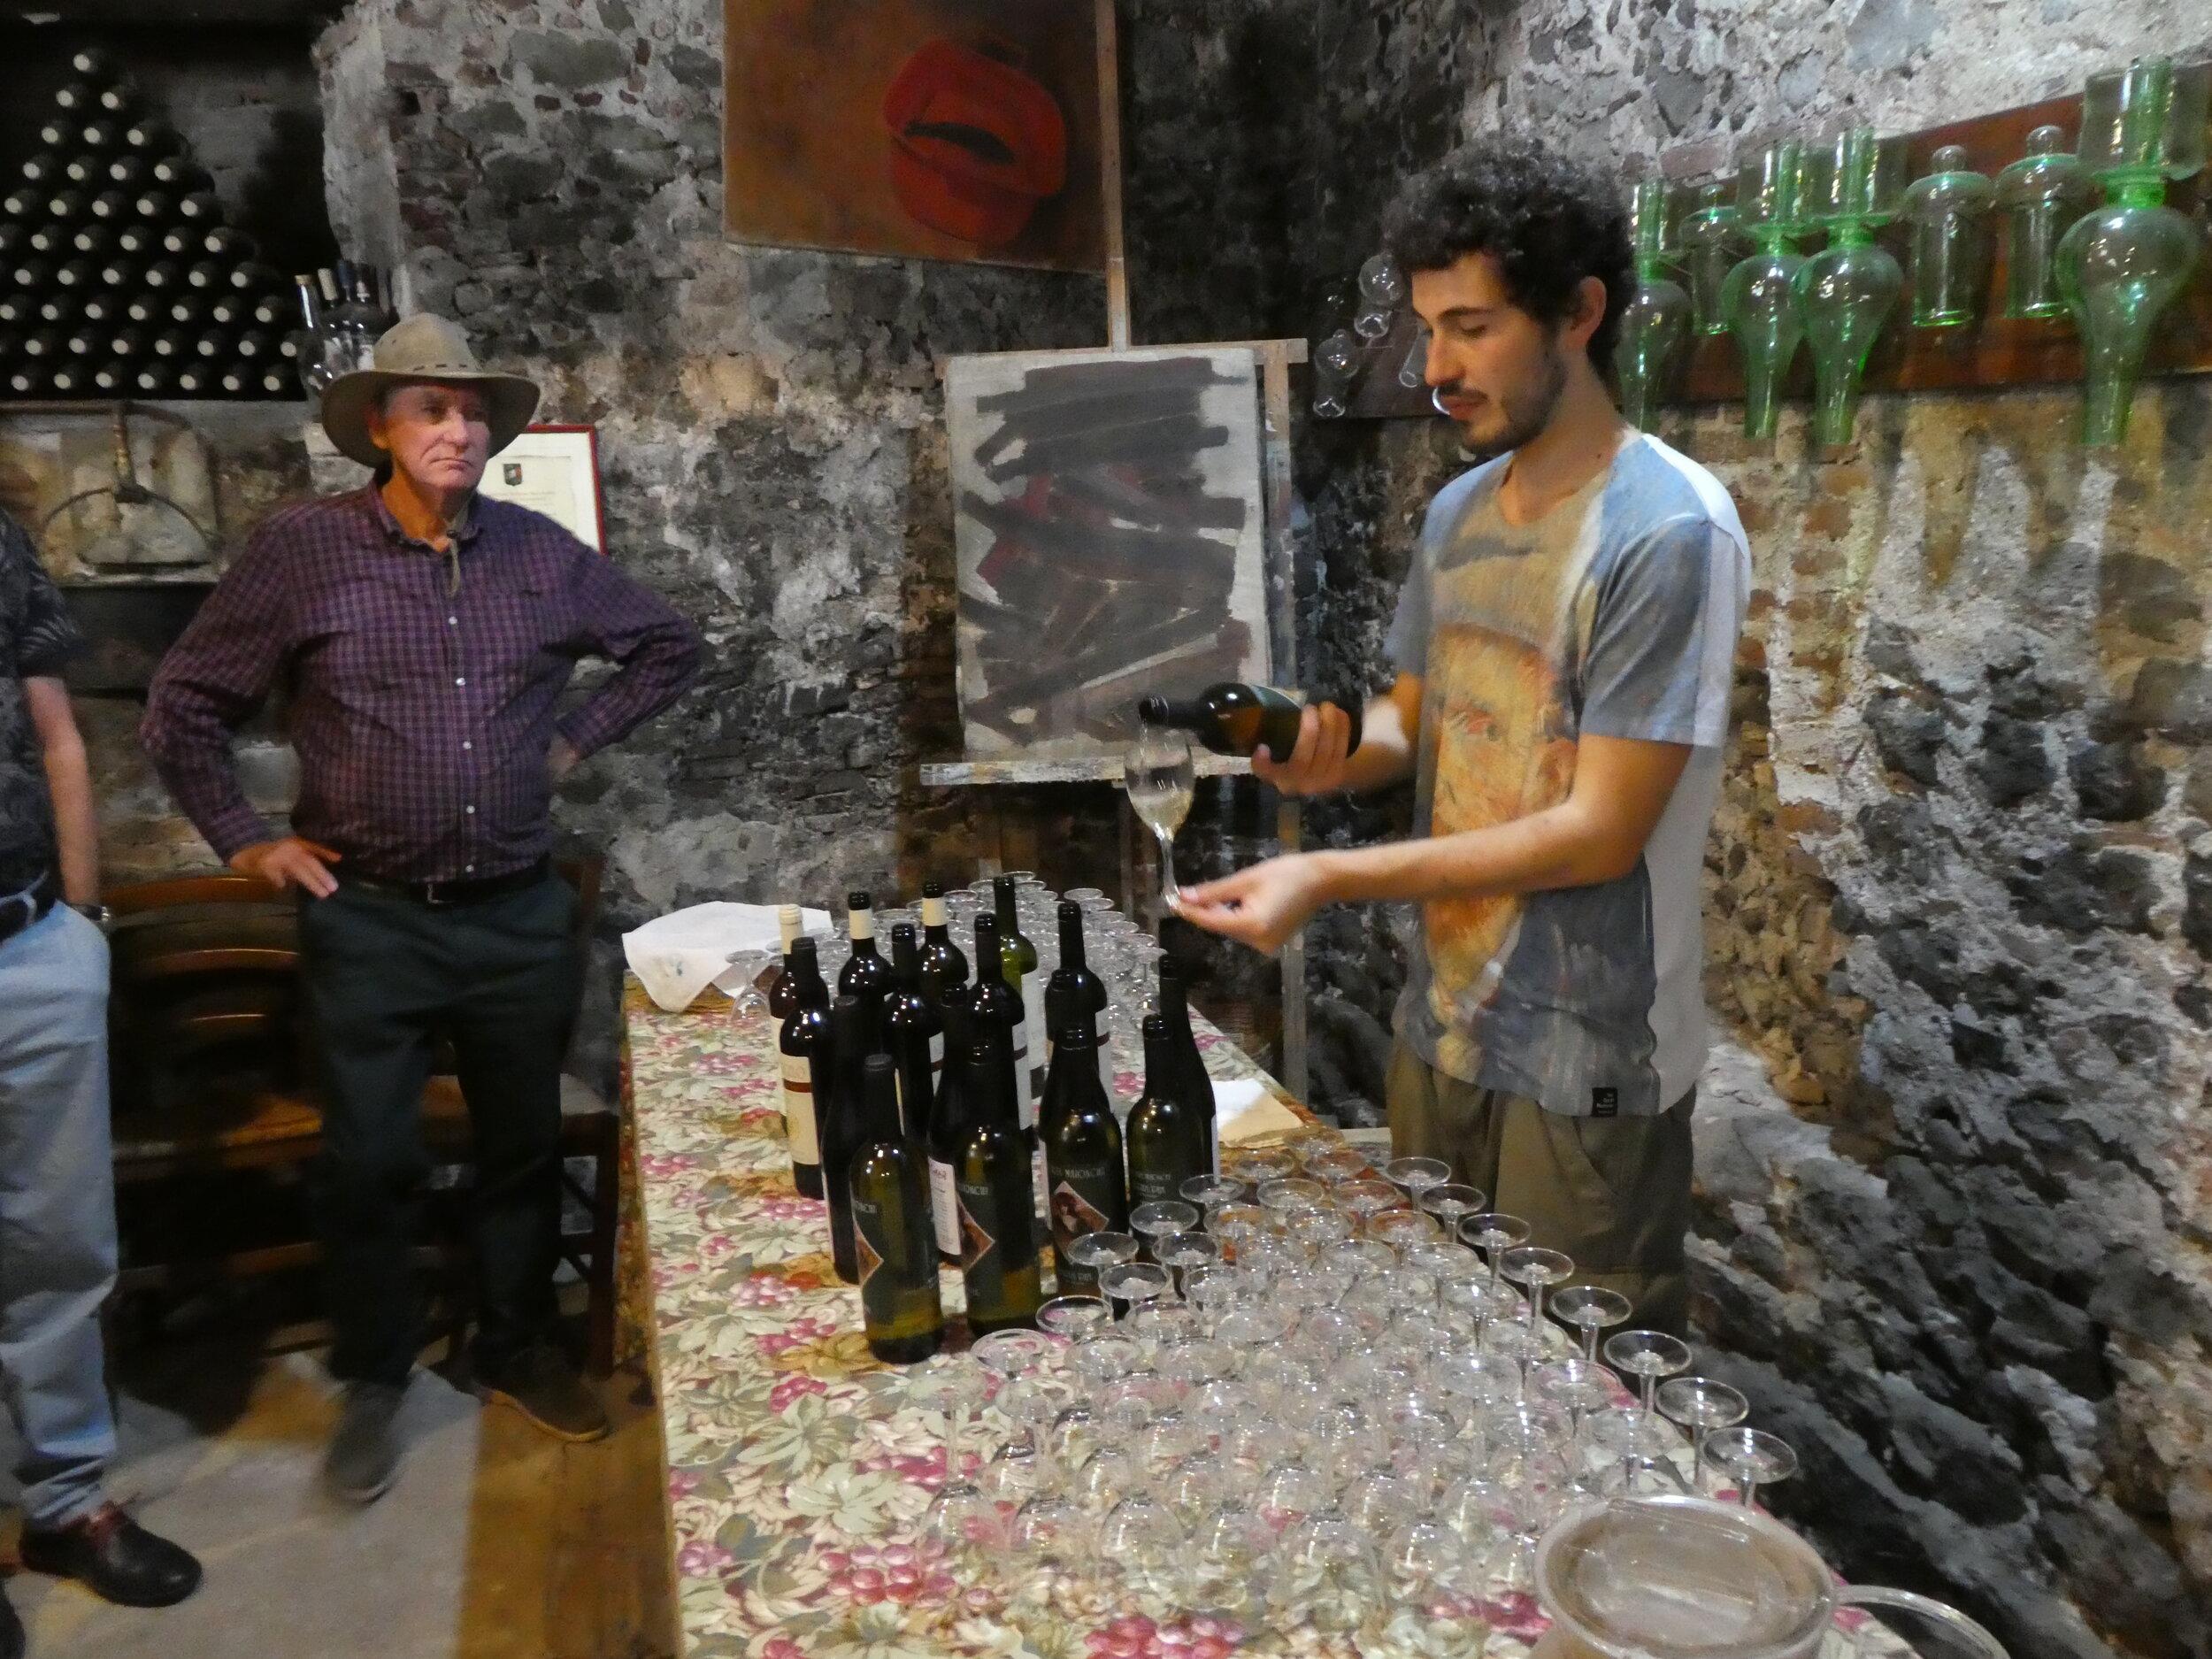 Italian Wine Samples in 17th Century Farmhouse